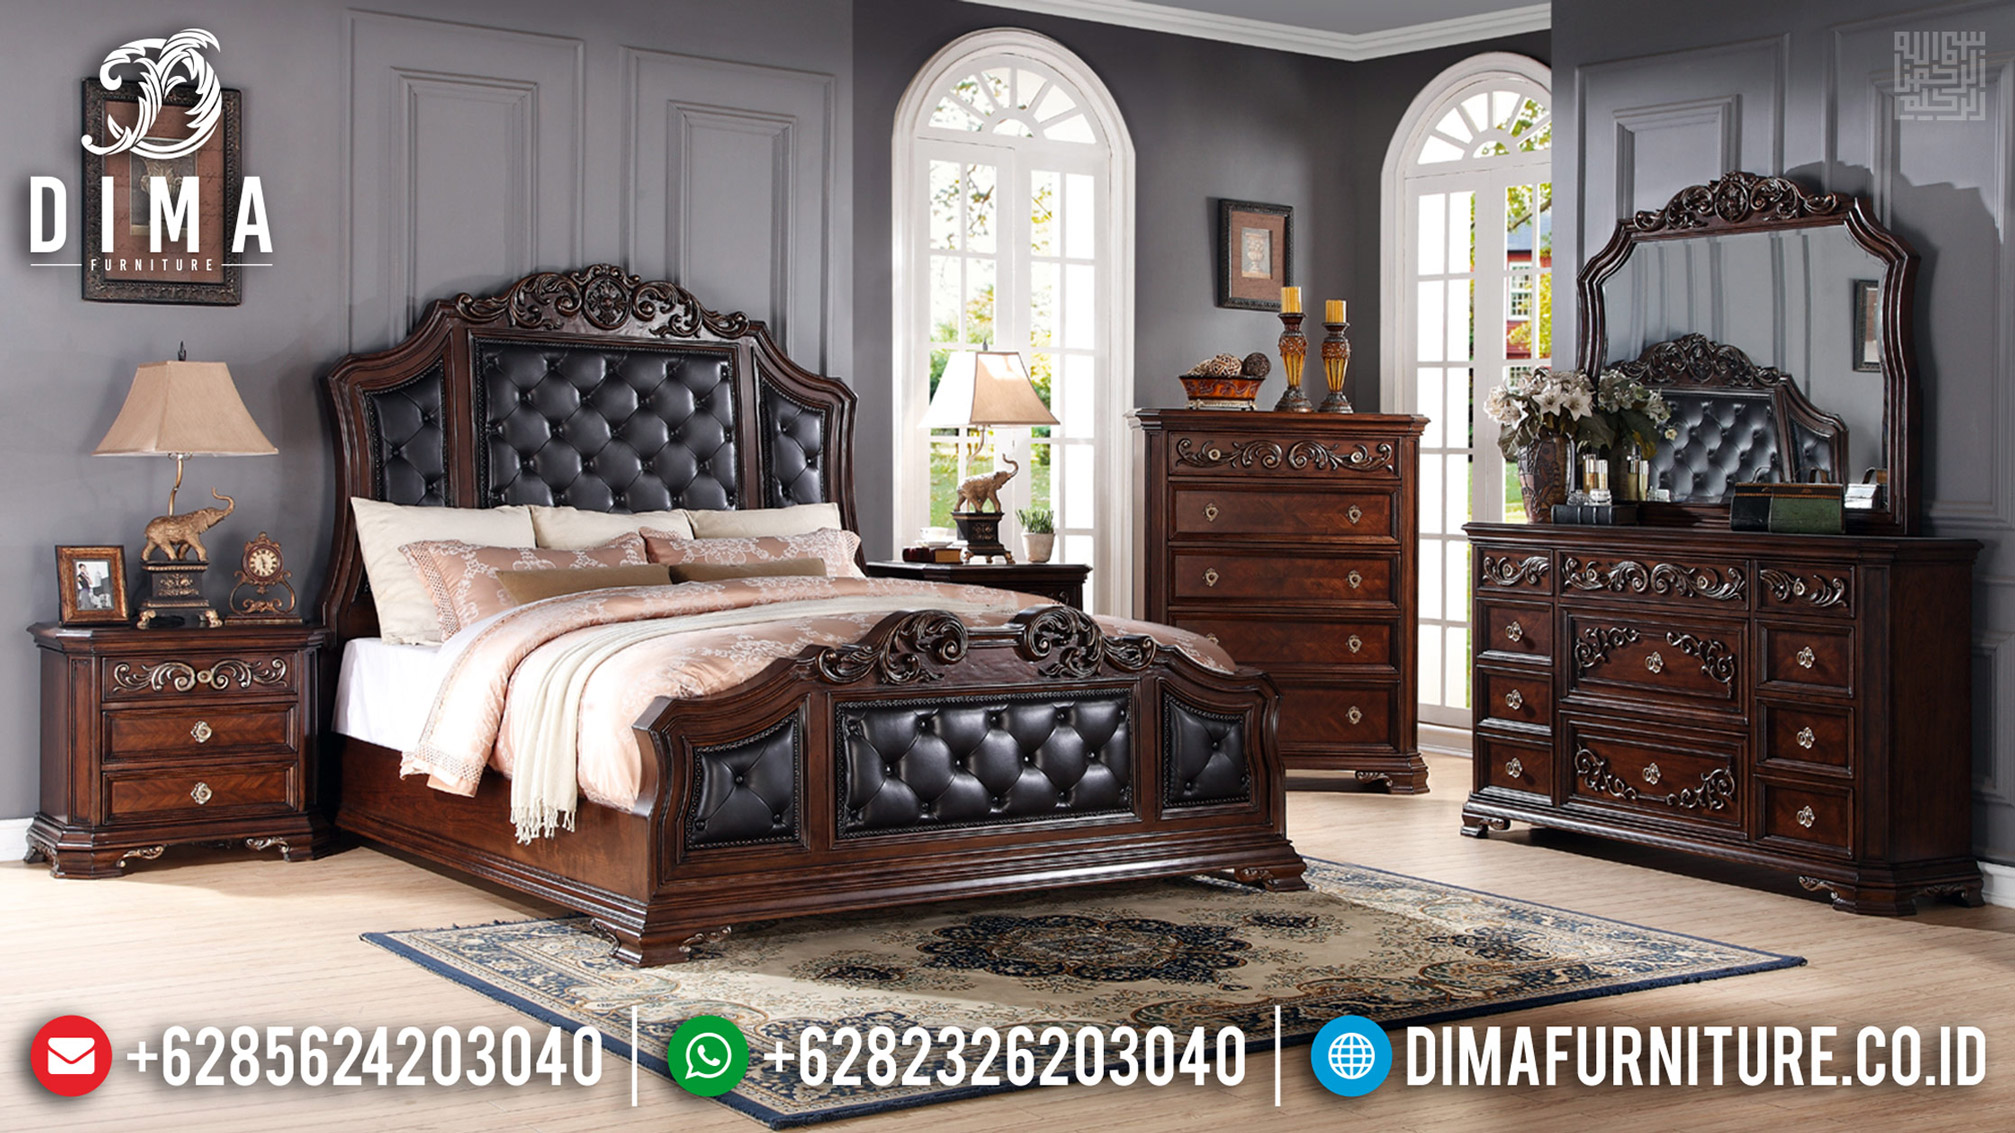 Kamar Set Mewah Jati Natural Klasik Ukiran Jepara Best Quality TTJ-0598